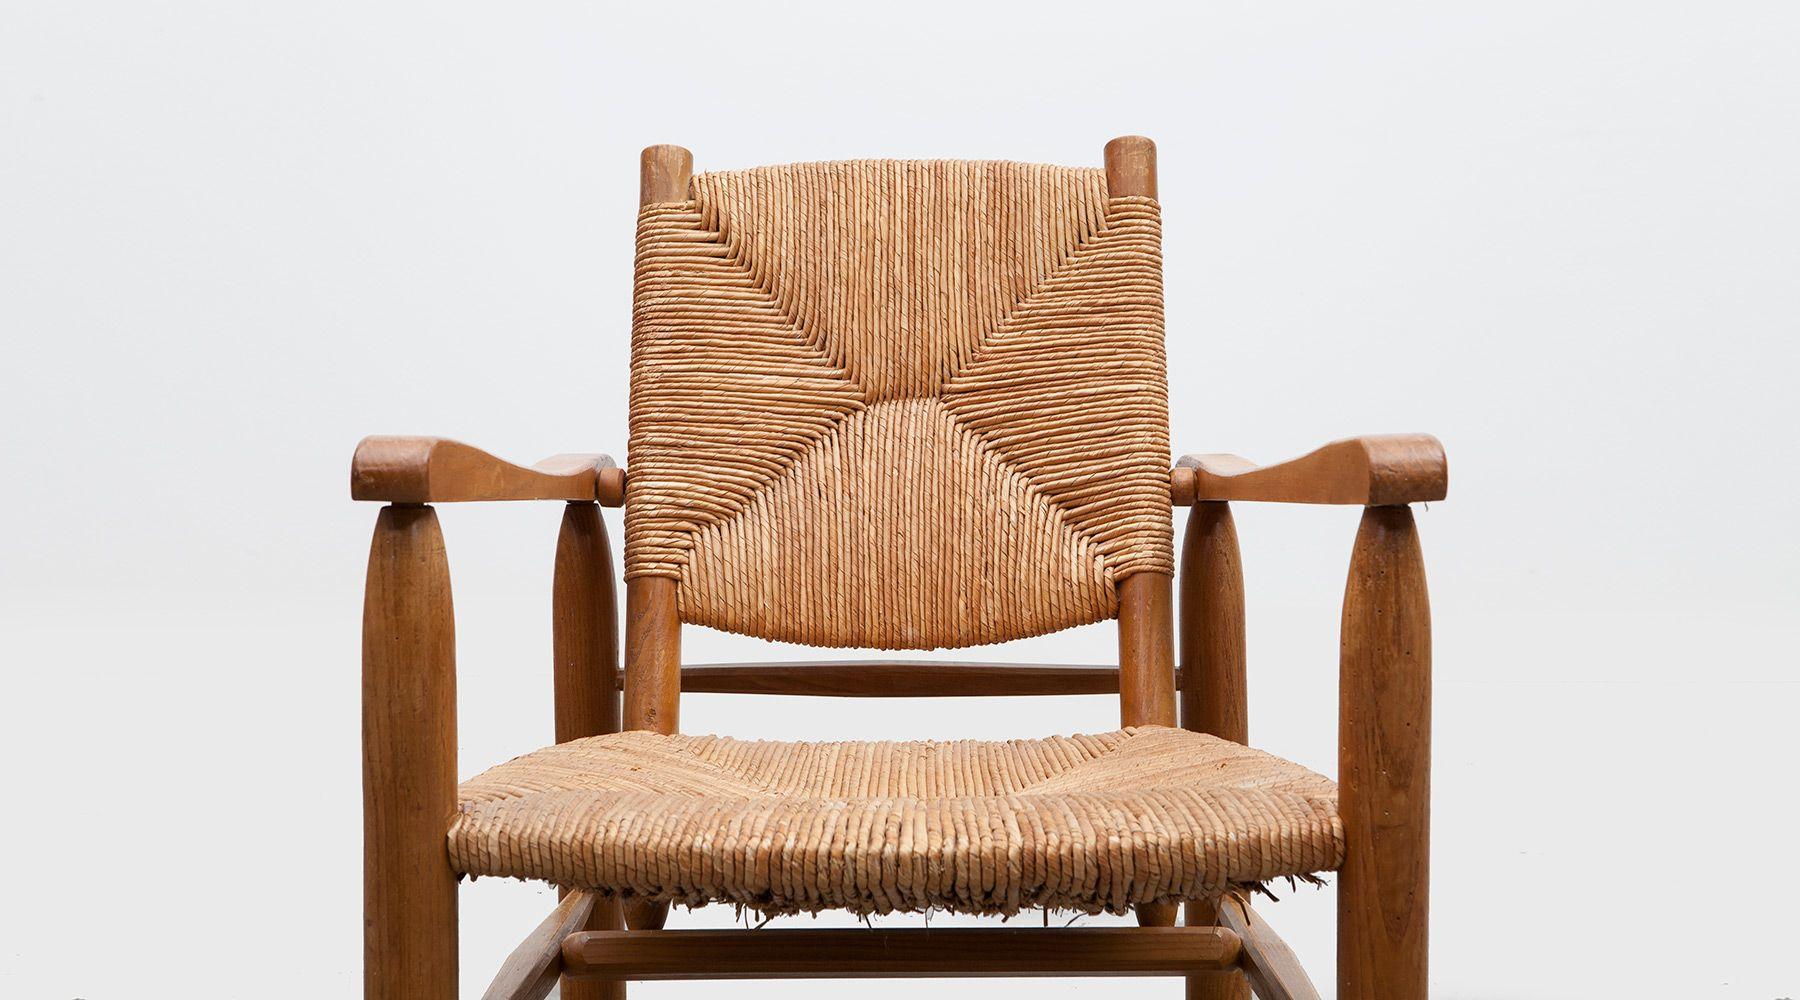 Stupendous Lounge Chairs 2 By Charlotte Perriand Frank Landau Inzonedesignstudio Interior Chair Design Inzonedesignstudiocom